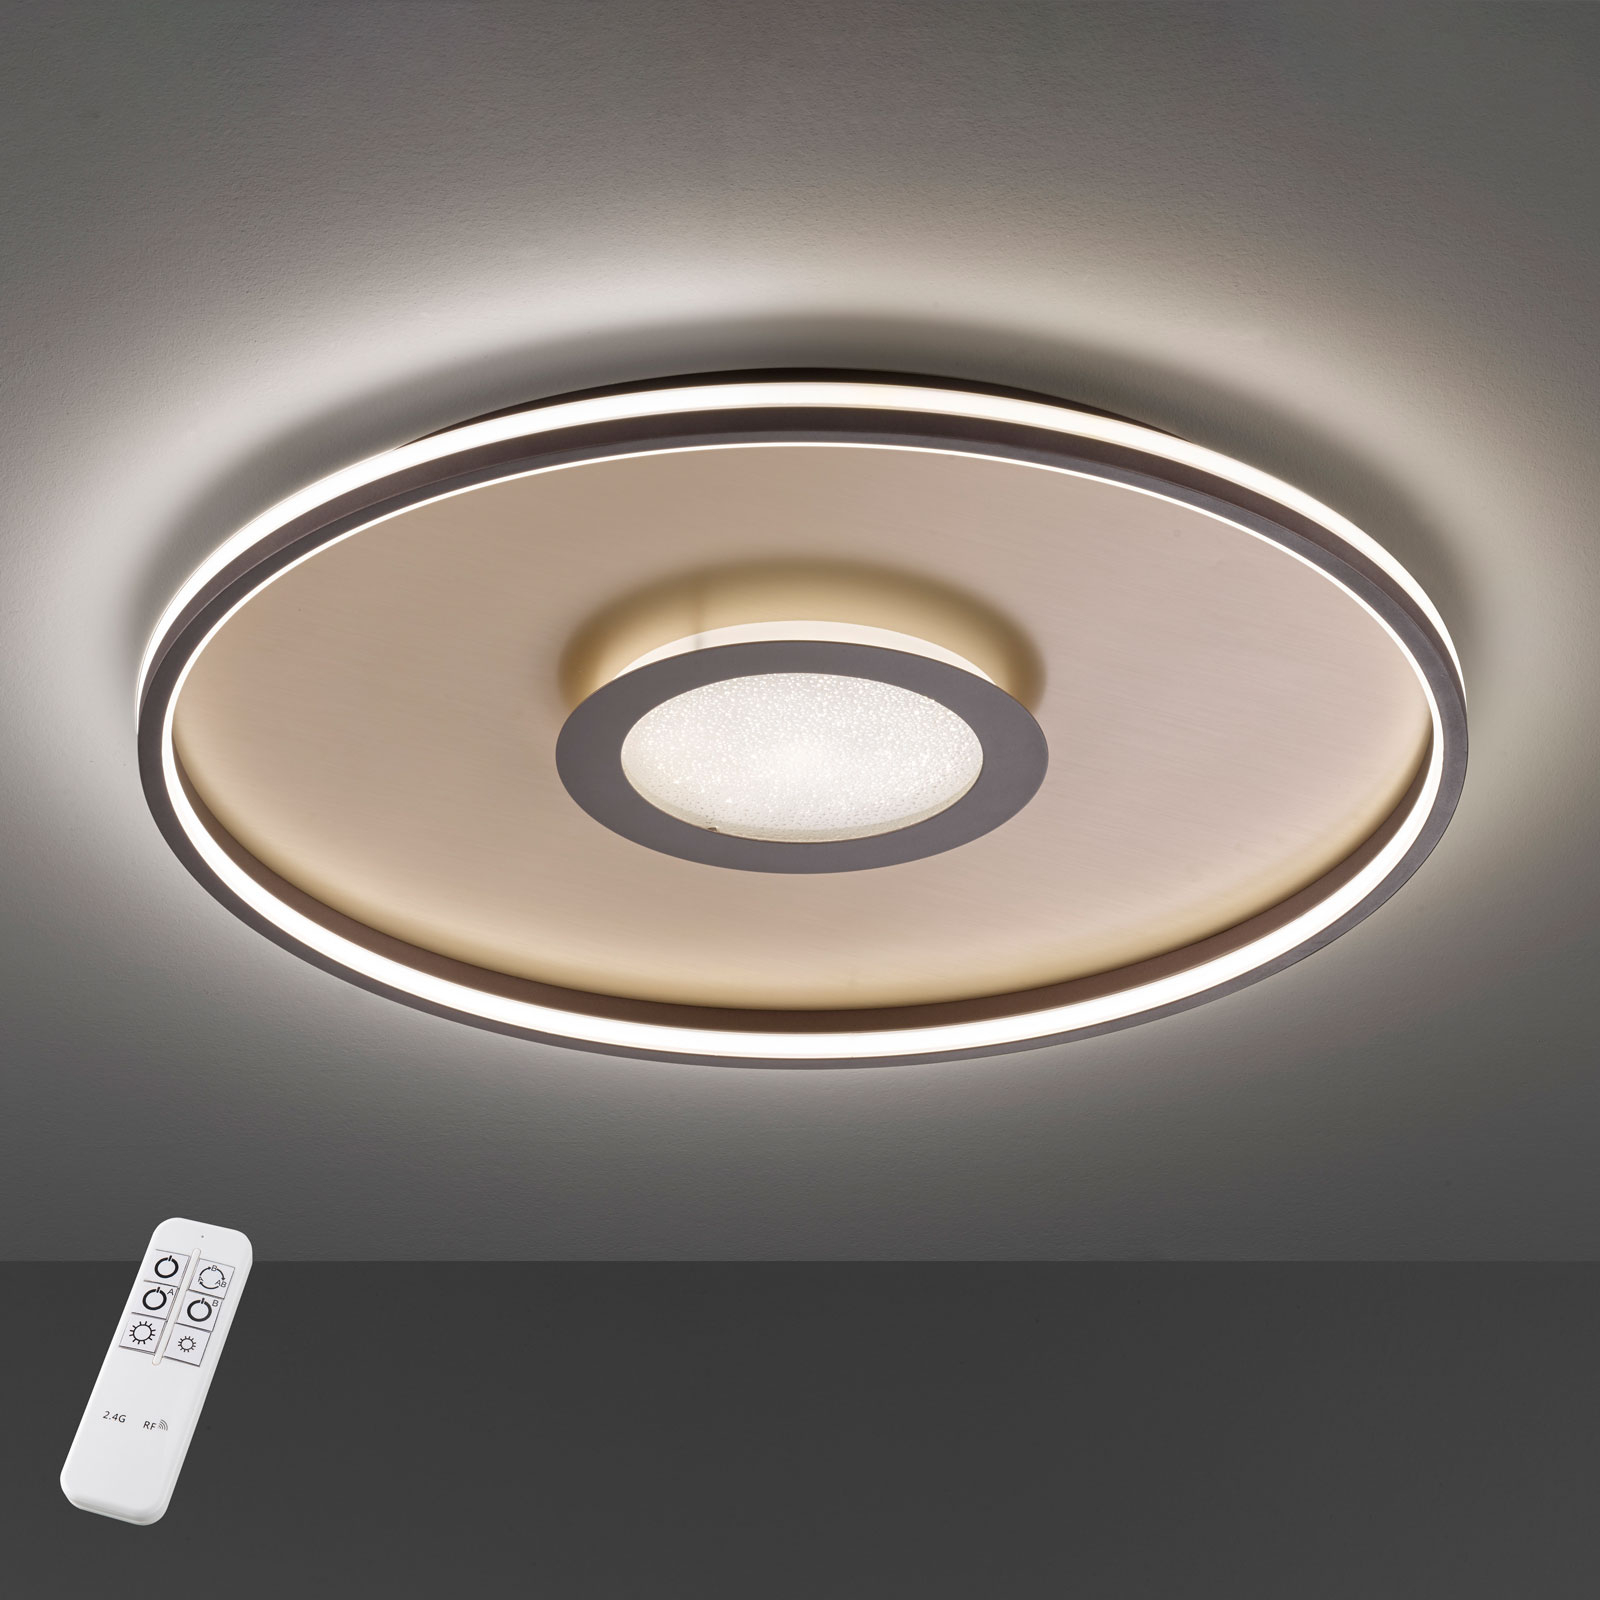 Lampa sufitowa LED Bug okrągła, rdza 81cm